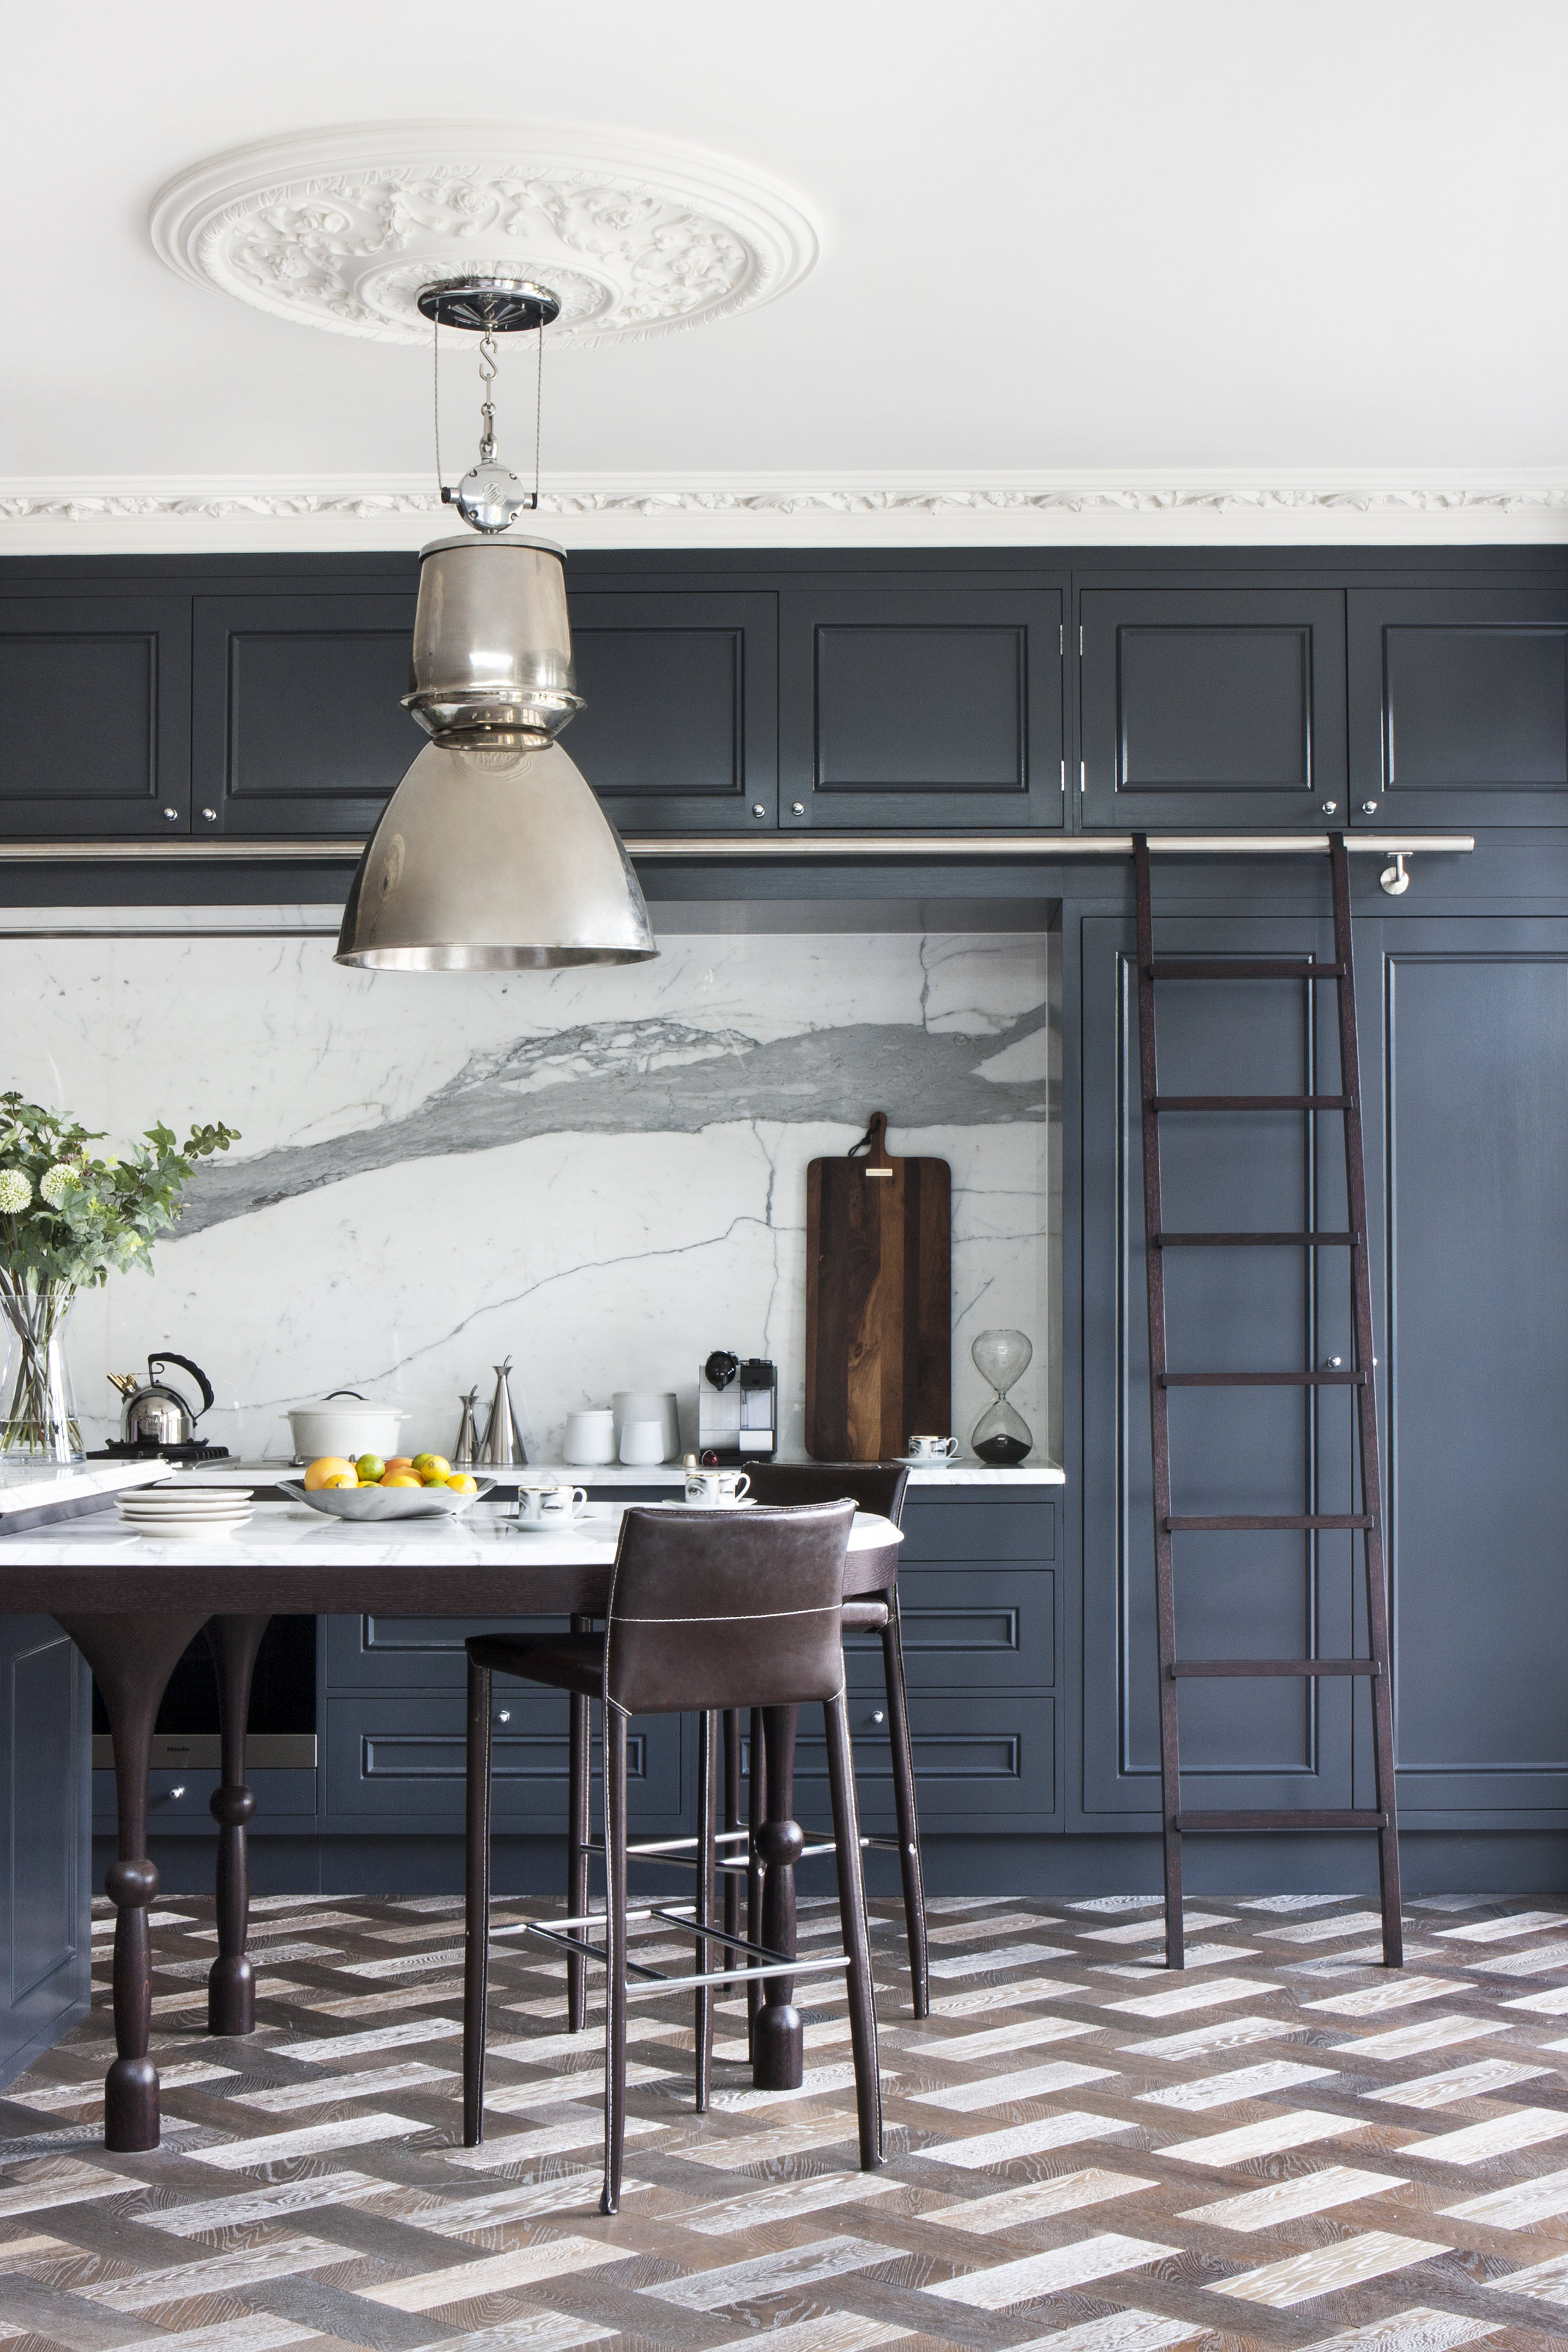 Kitchen IMG_0061.jpg